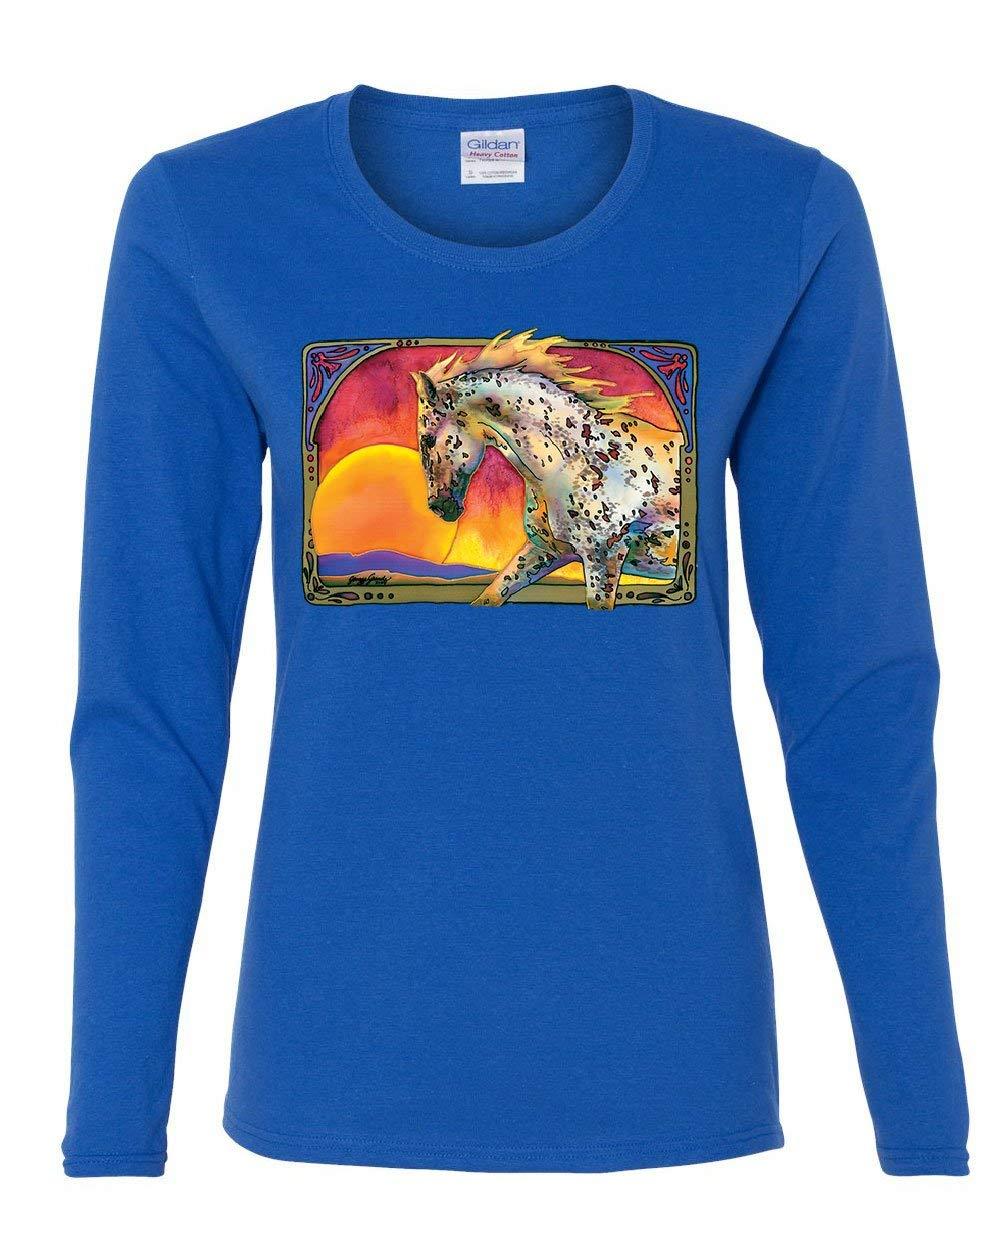 Horse Prancing In Sunset Tee Animal Wildlife Mare Stallion Shirts